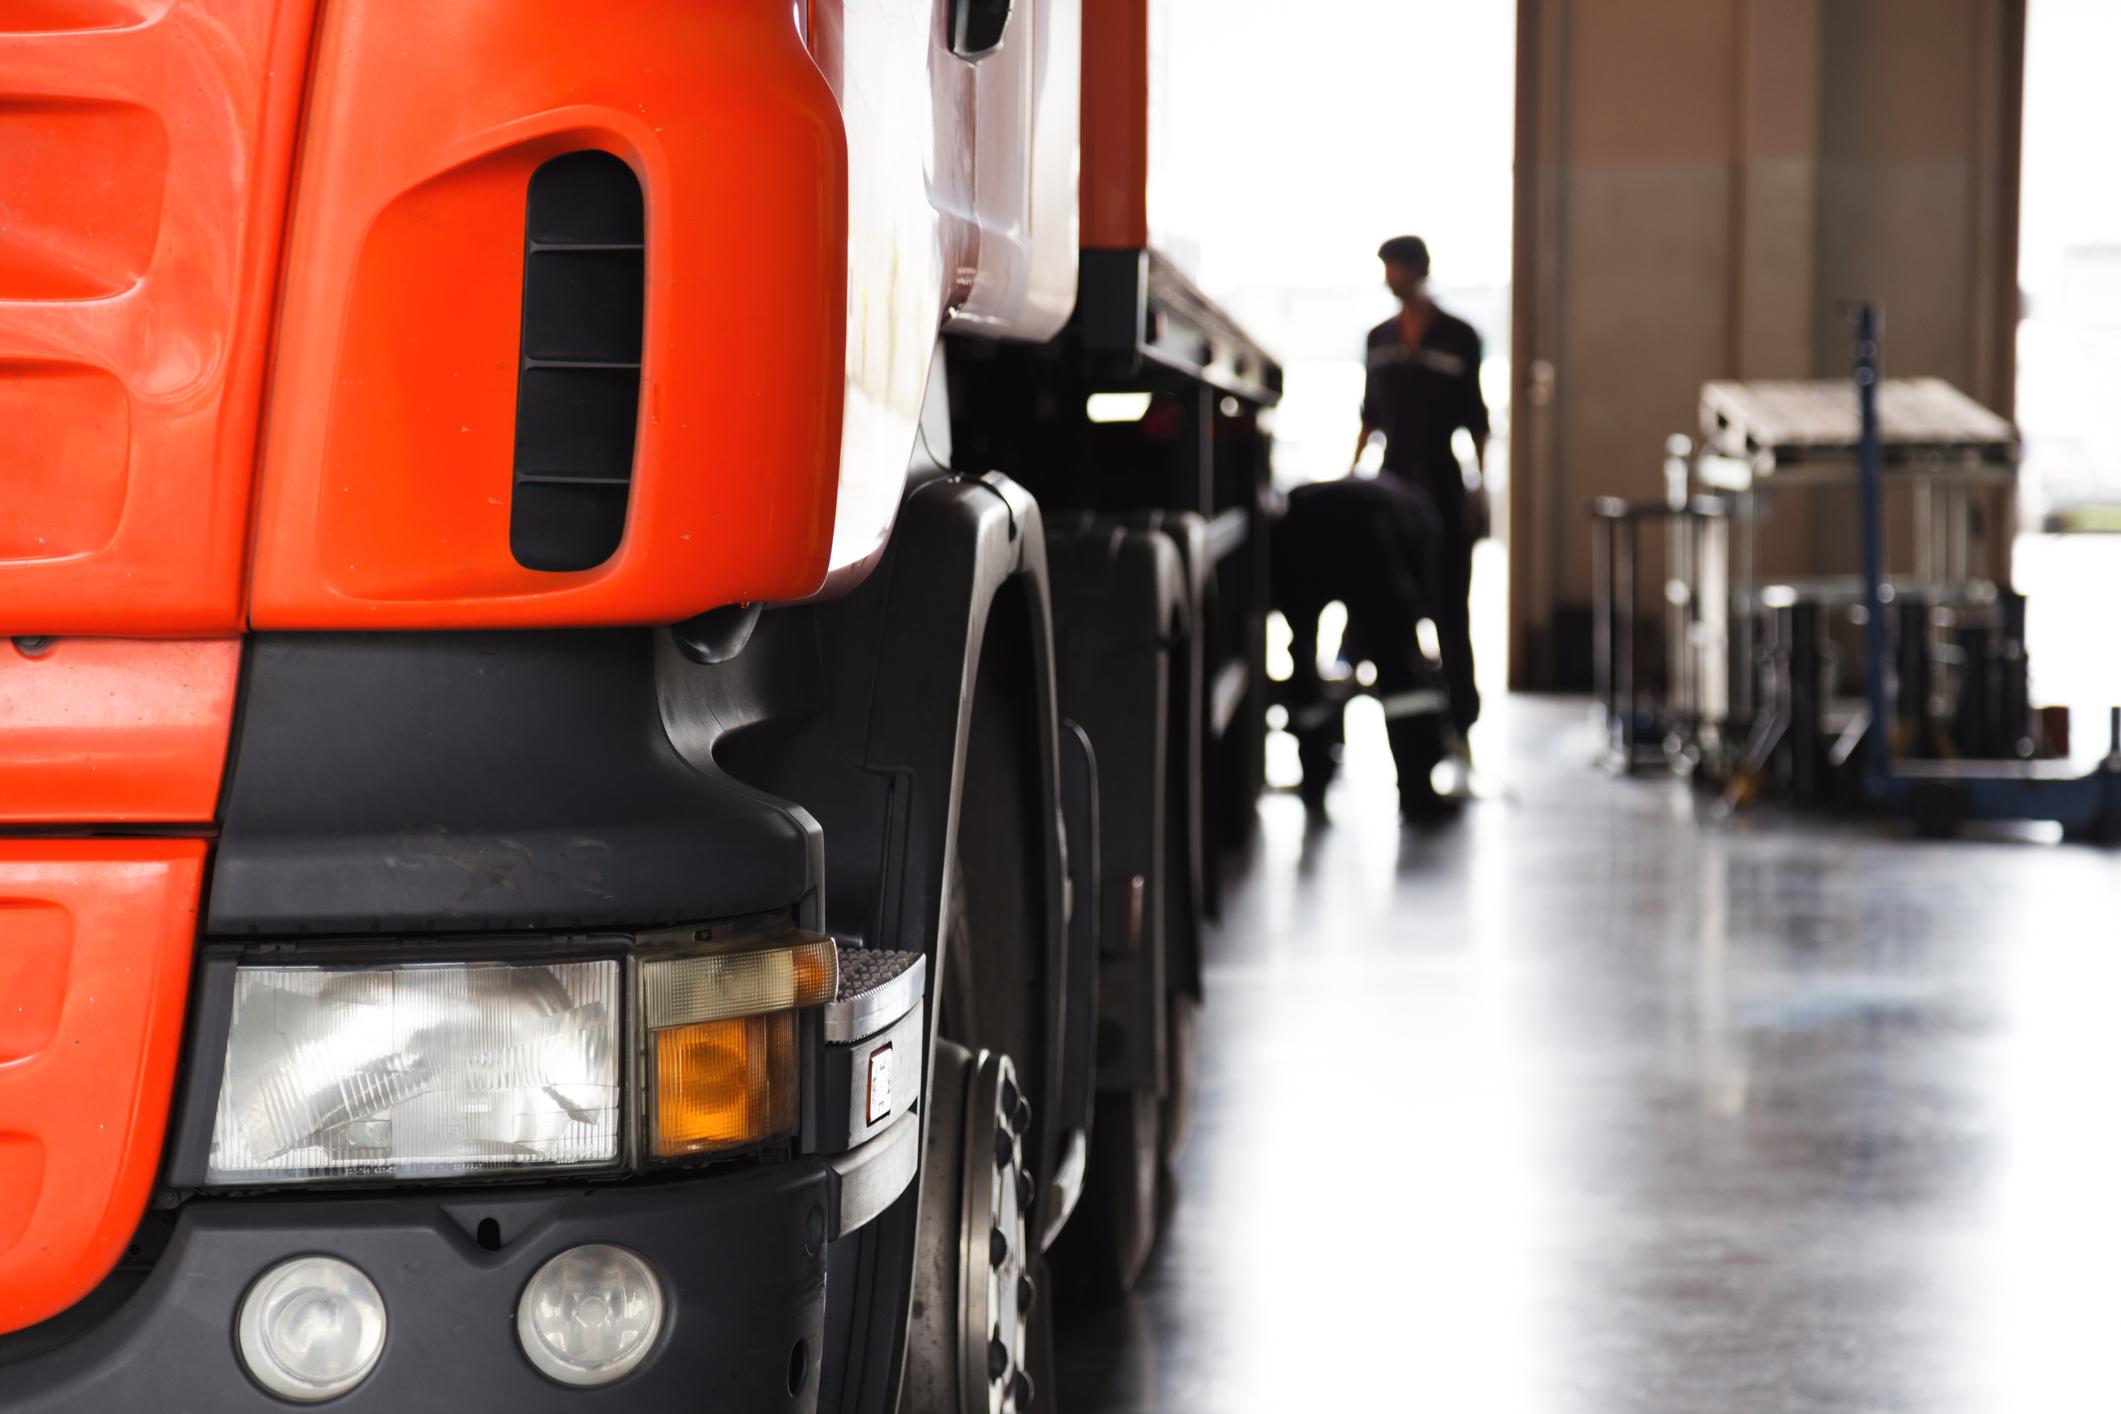 Vehicle mechanic inspecting semi-truck in large maintenance garage.